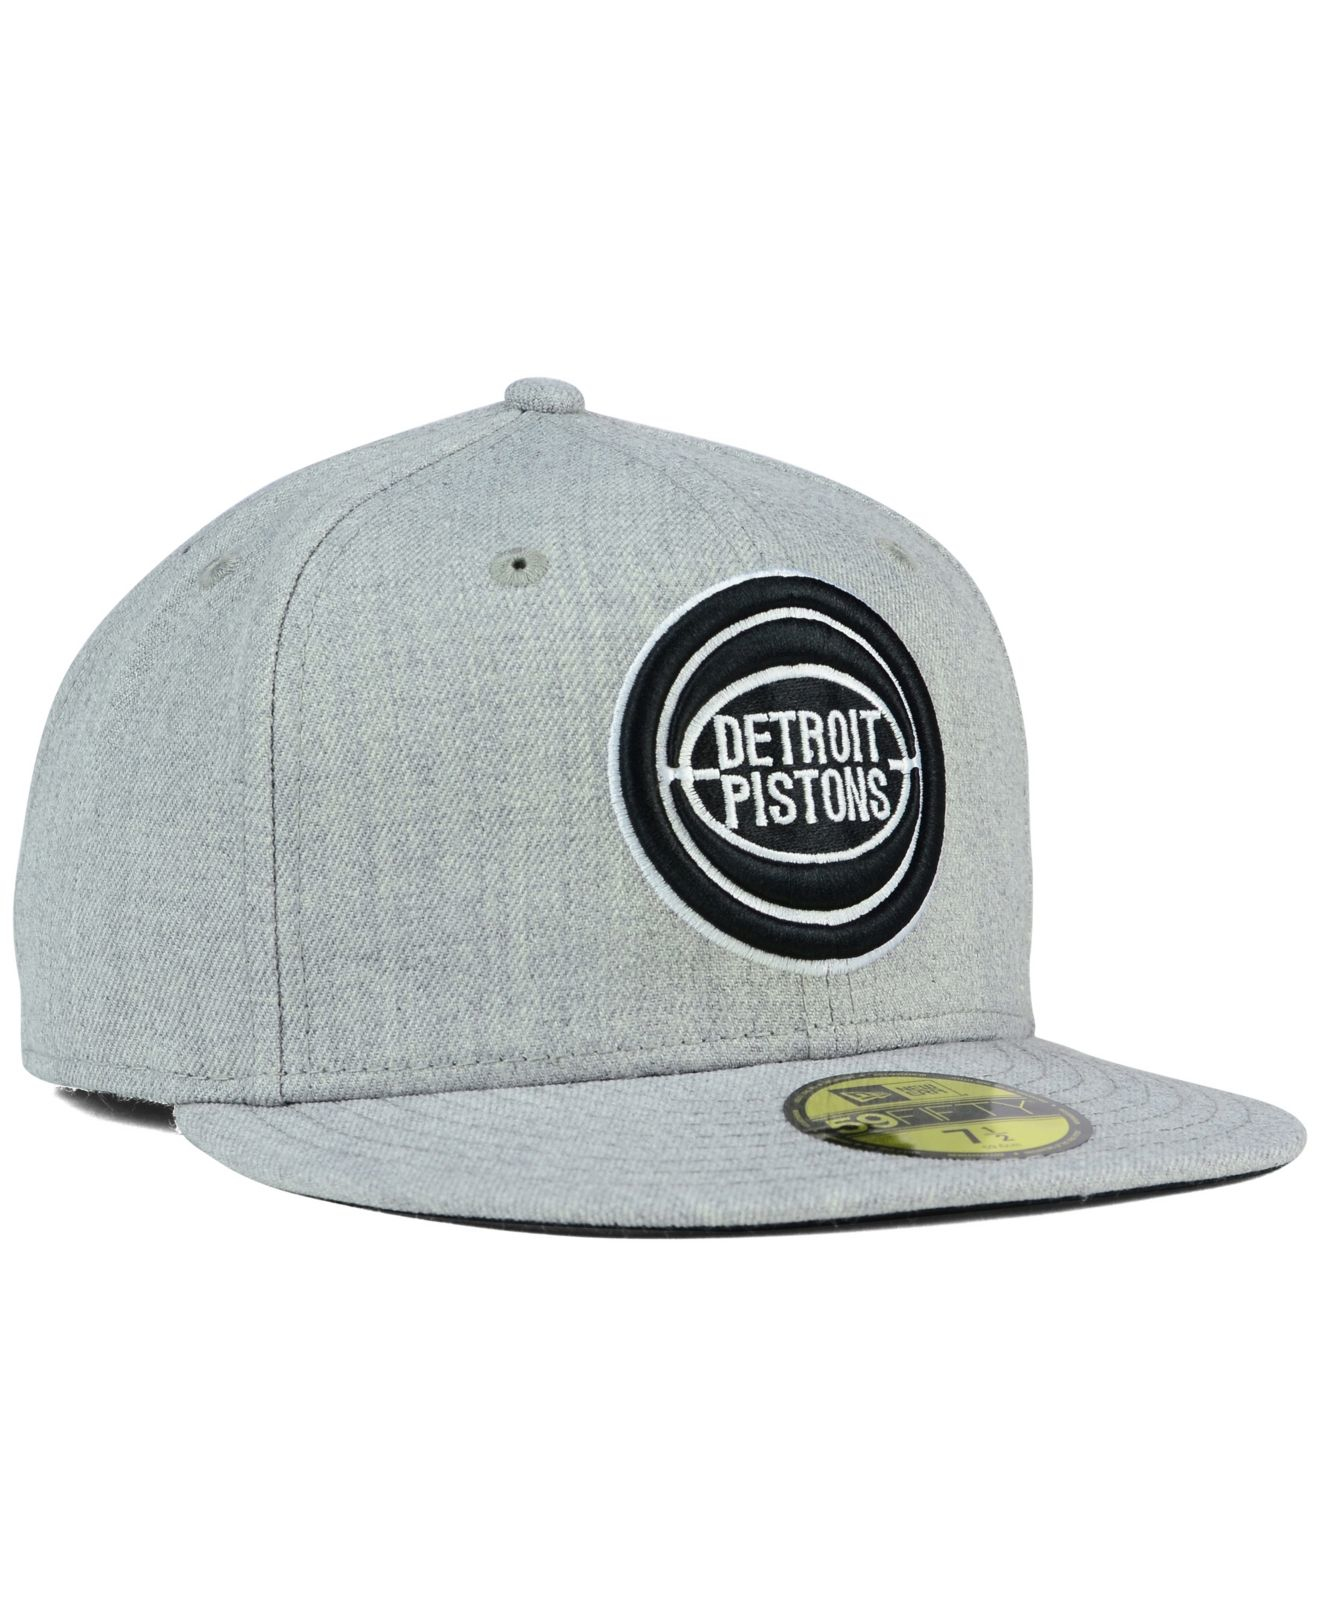 cheaper 7d90a 1c4b9 ... ireland lyst ktz detroit pistons heather black white 59fifty cap in  gray 63049 a9505